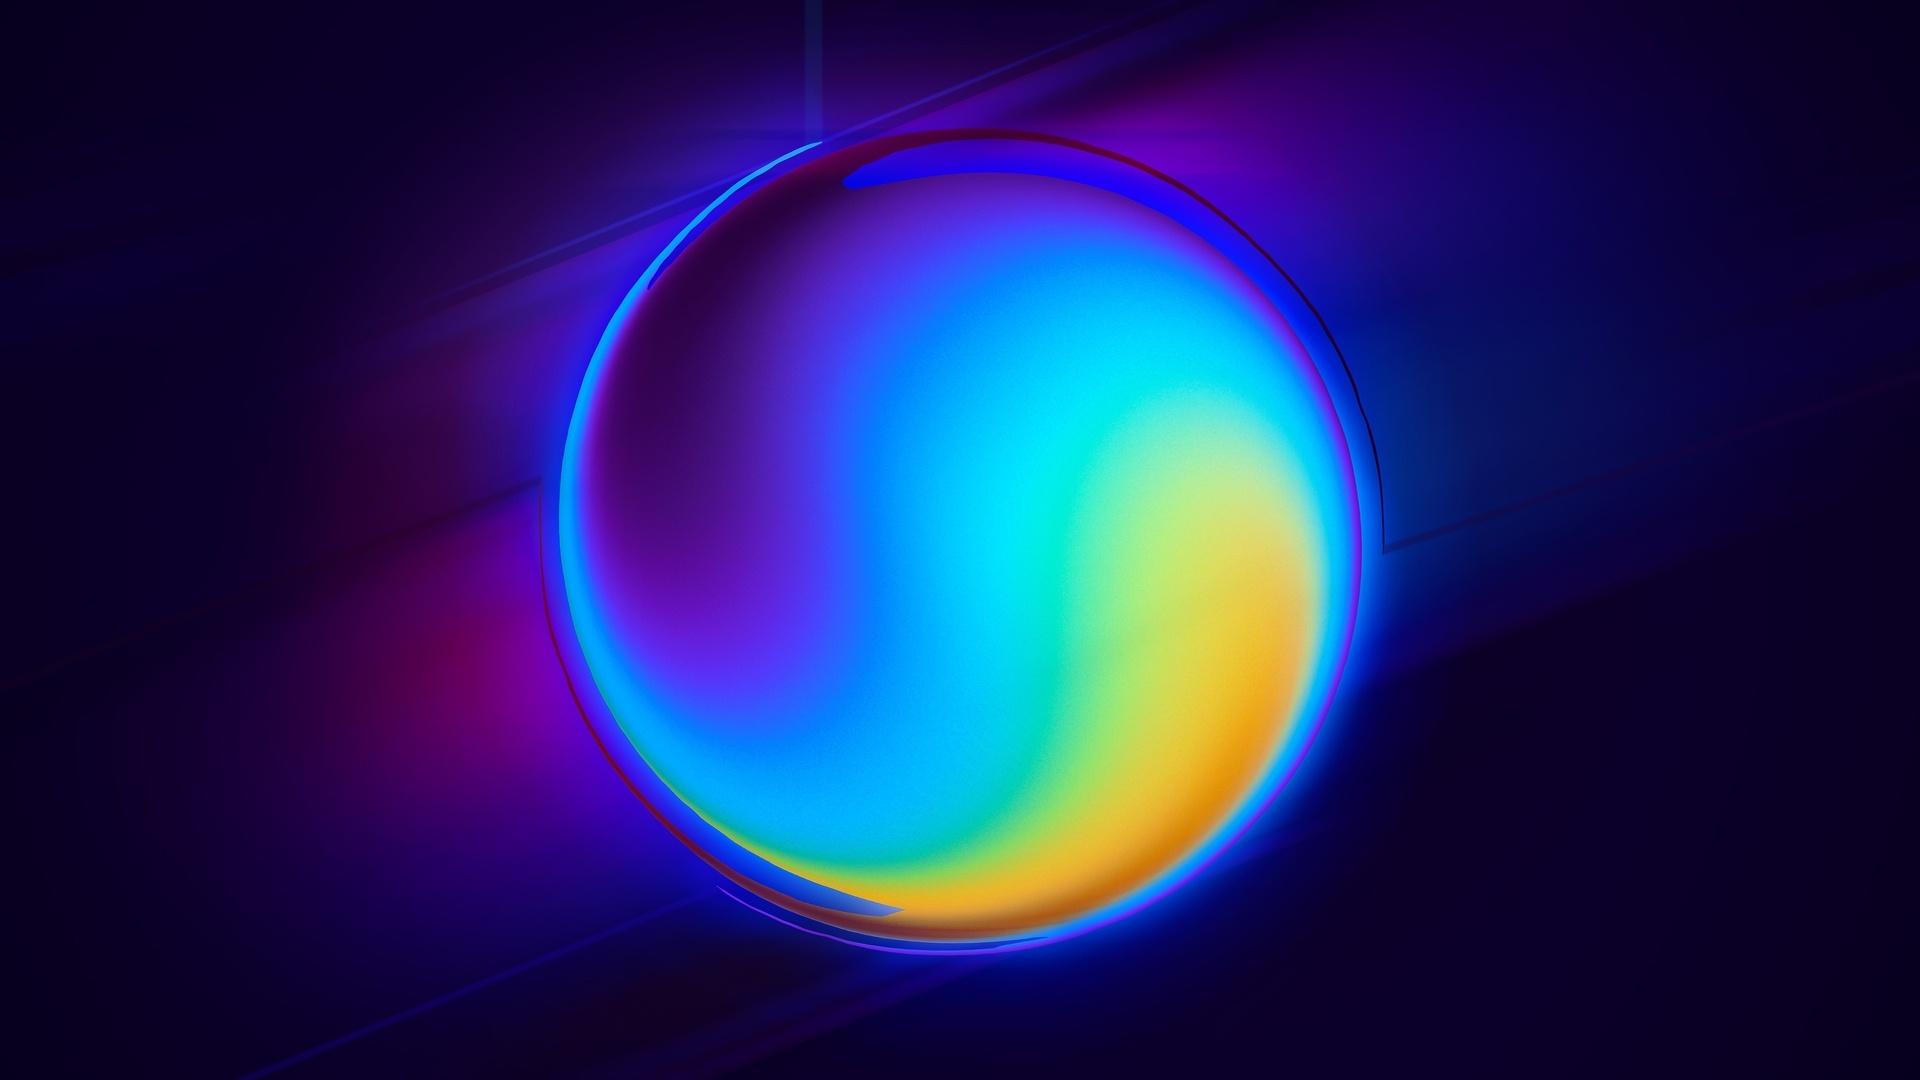 Neon Balloon Picture